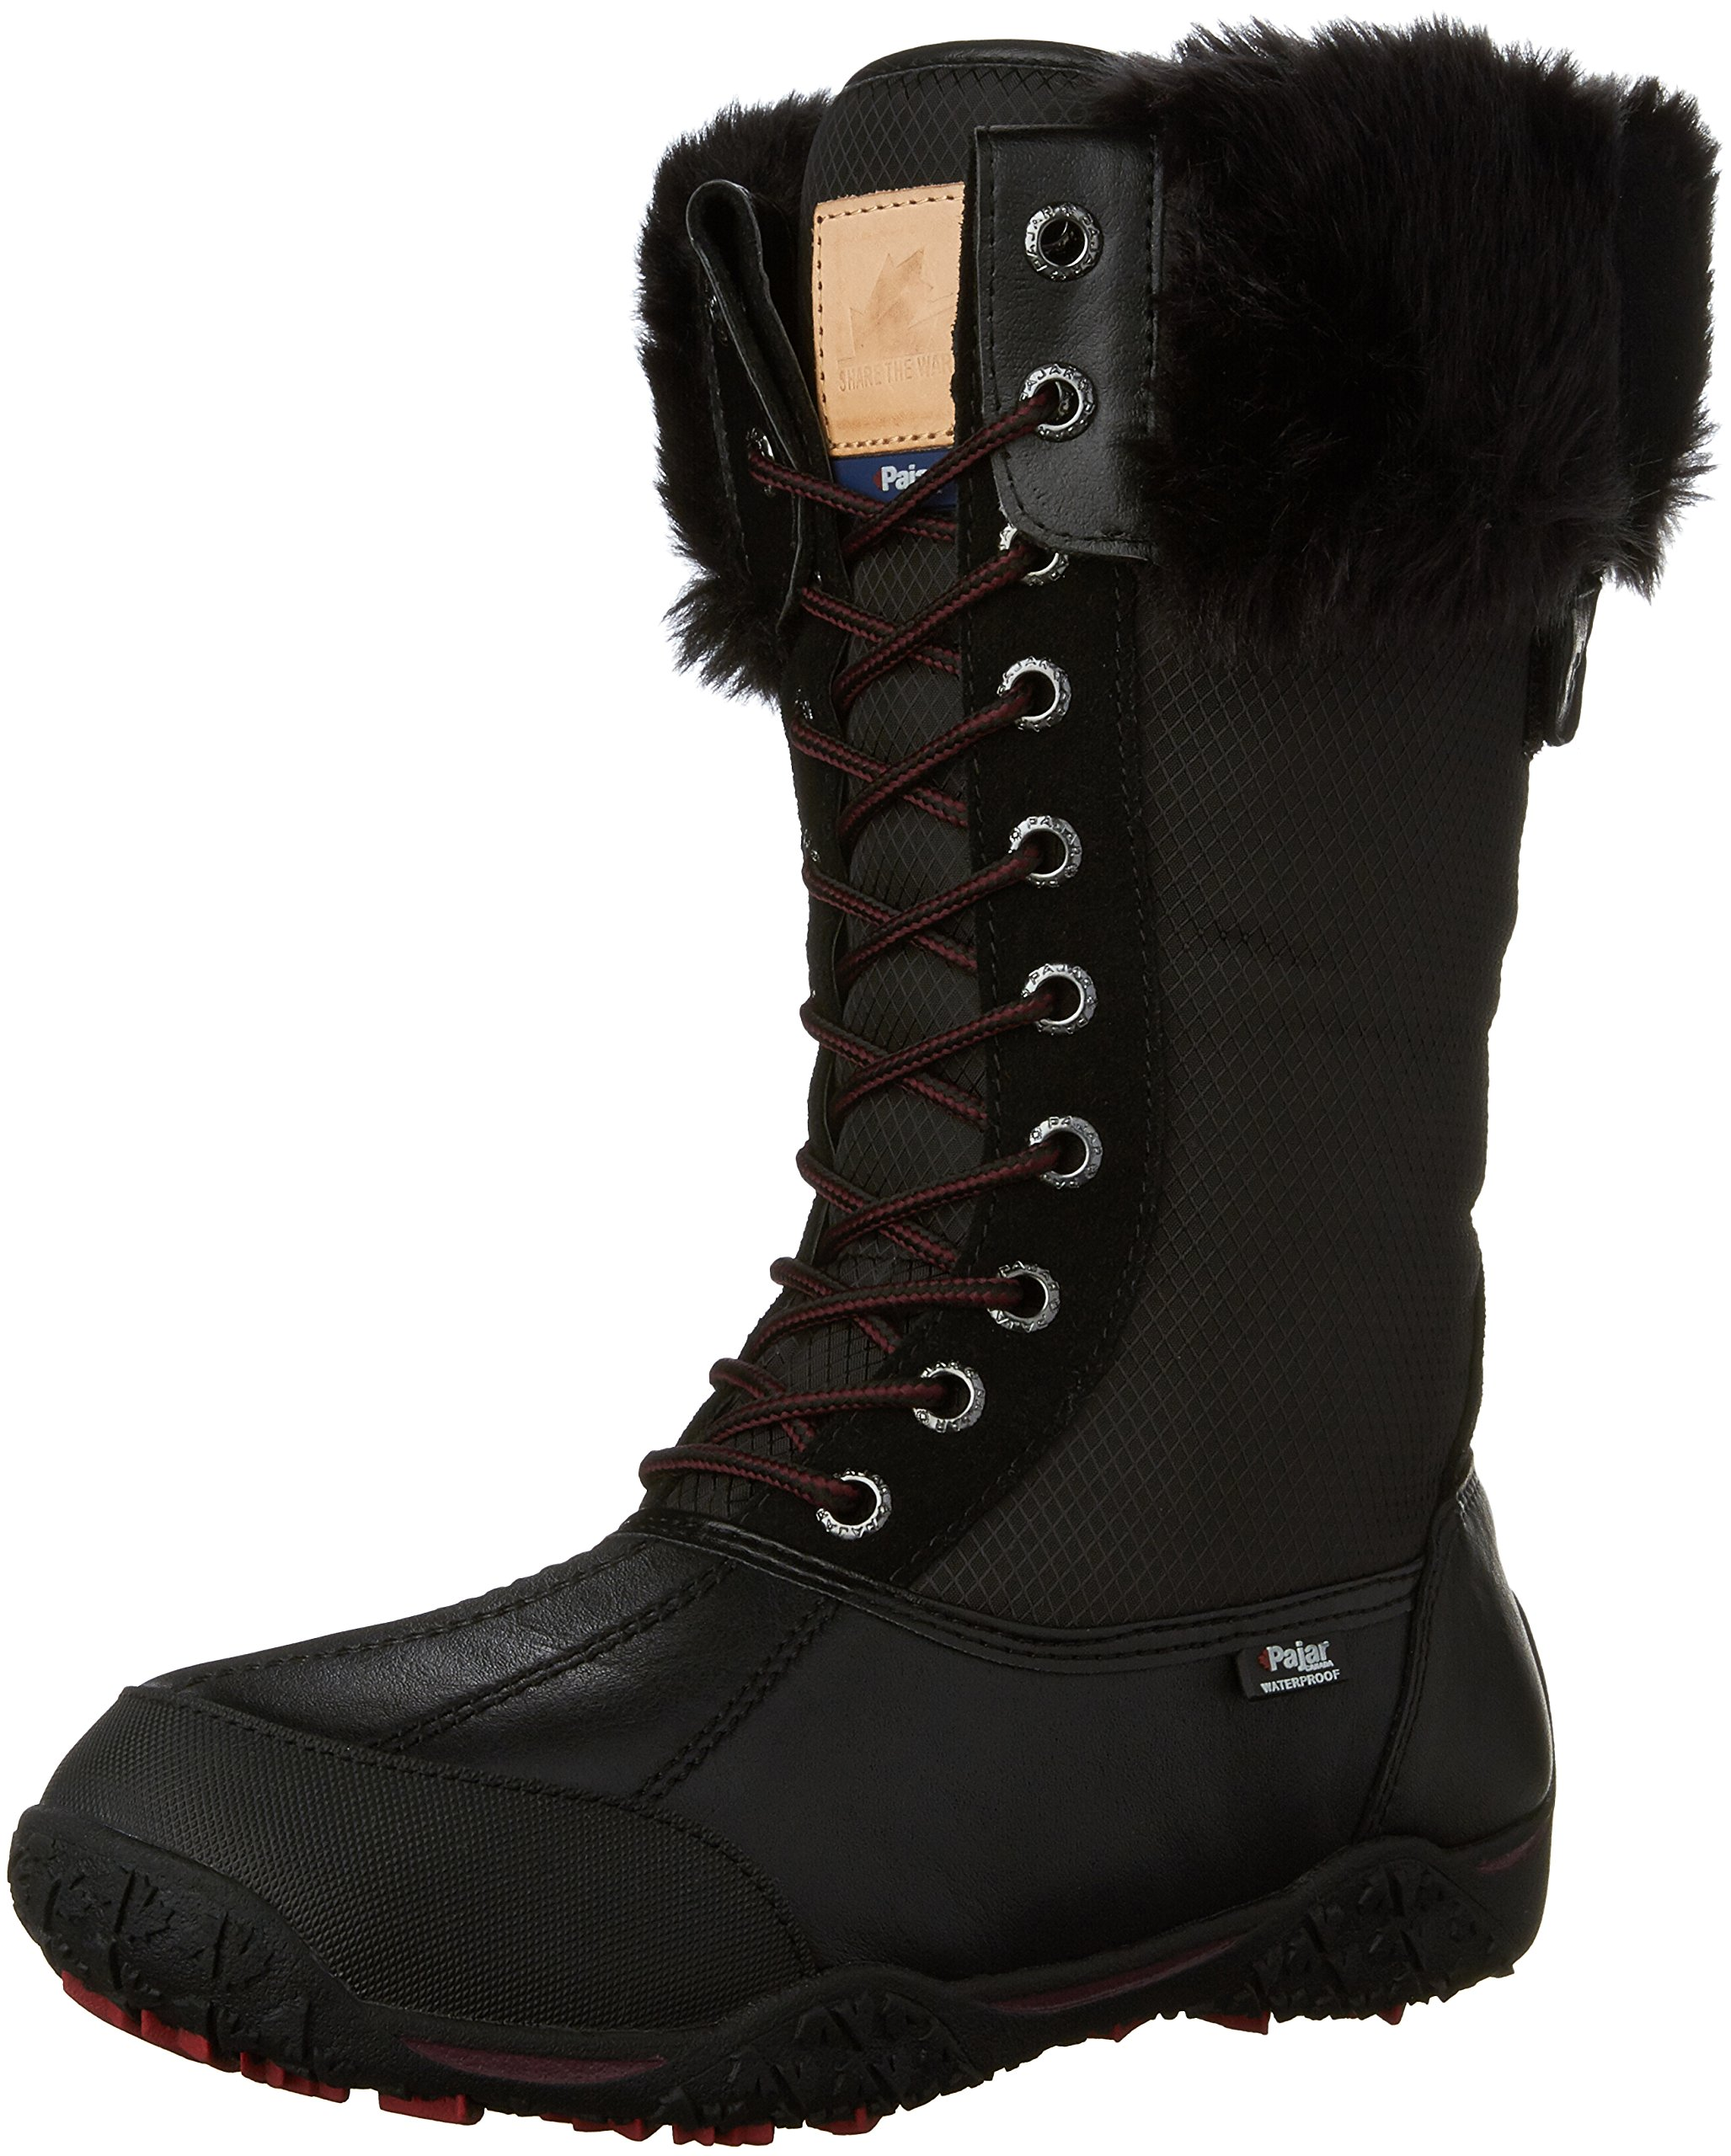 Pajar Women's Genevieve Snow Boot, Black/Black, 39 EU/8-8.5 M US